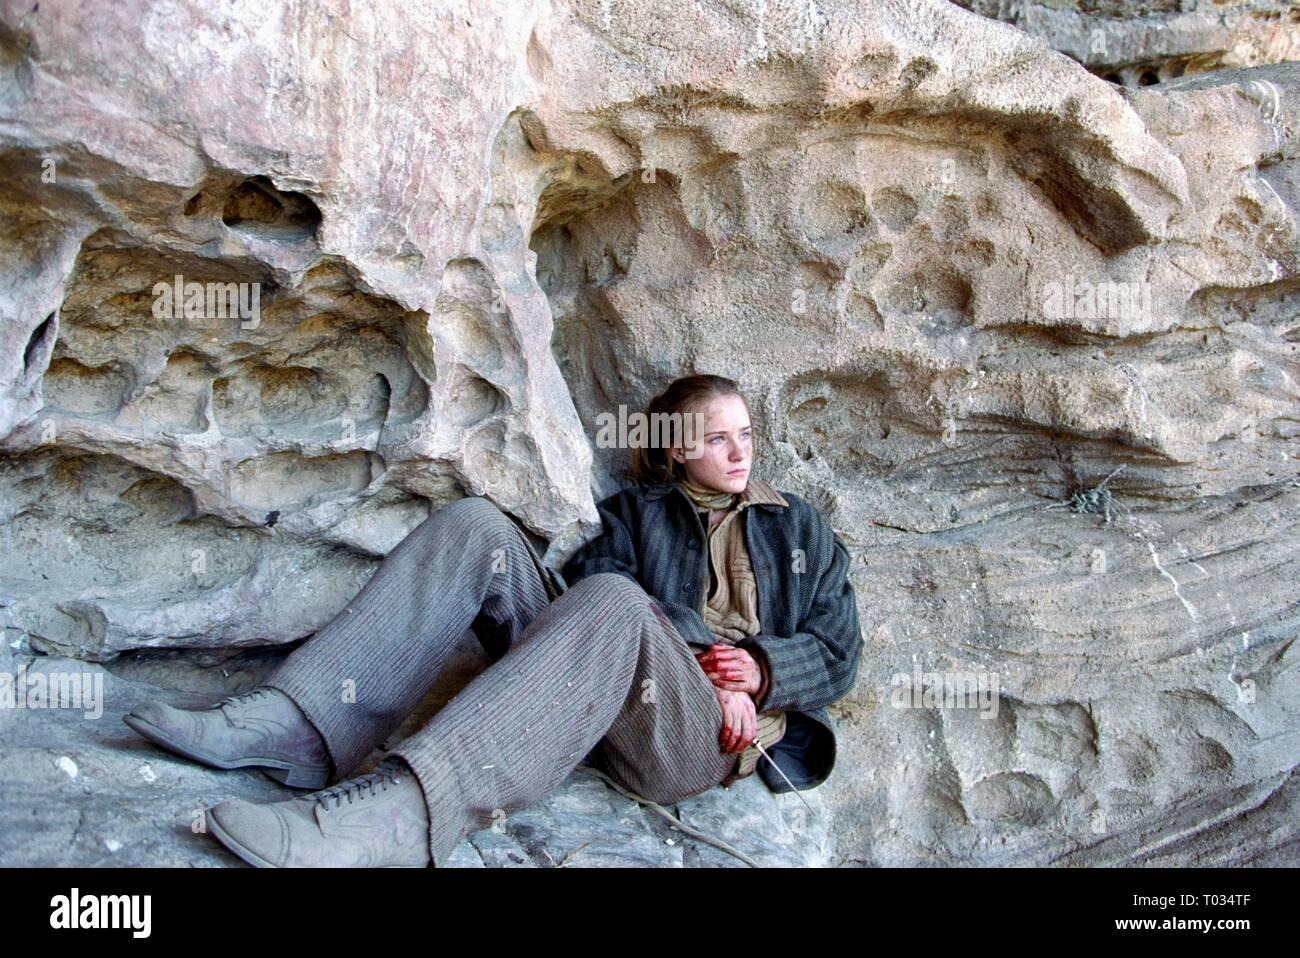 EVAN RACHEL WOOD, THE MISSING, 2003 - Stock Image